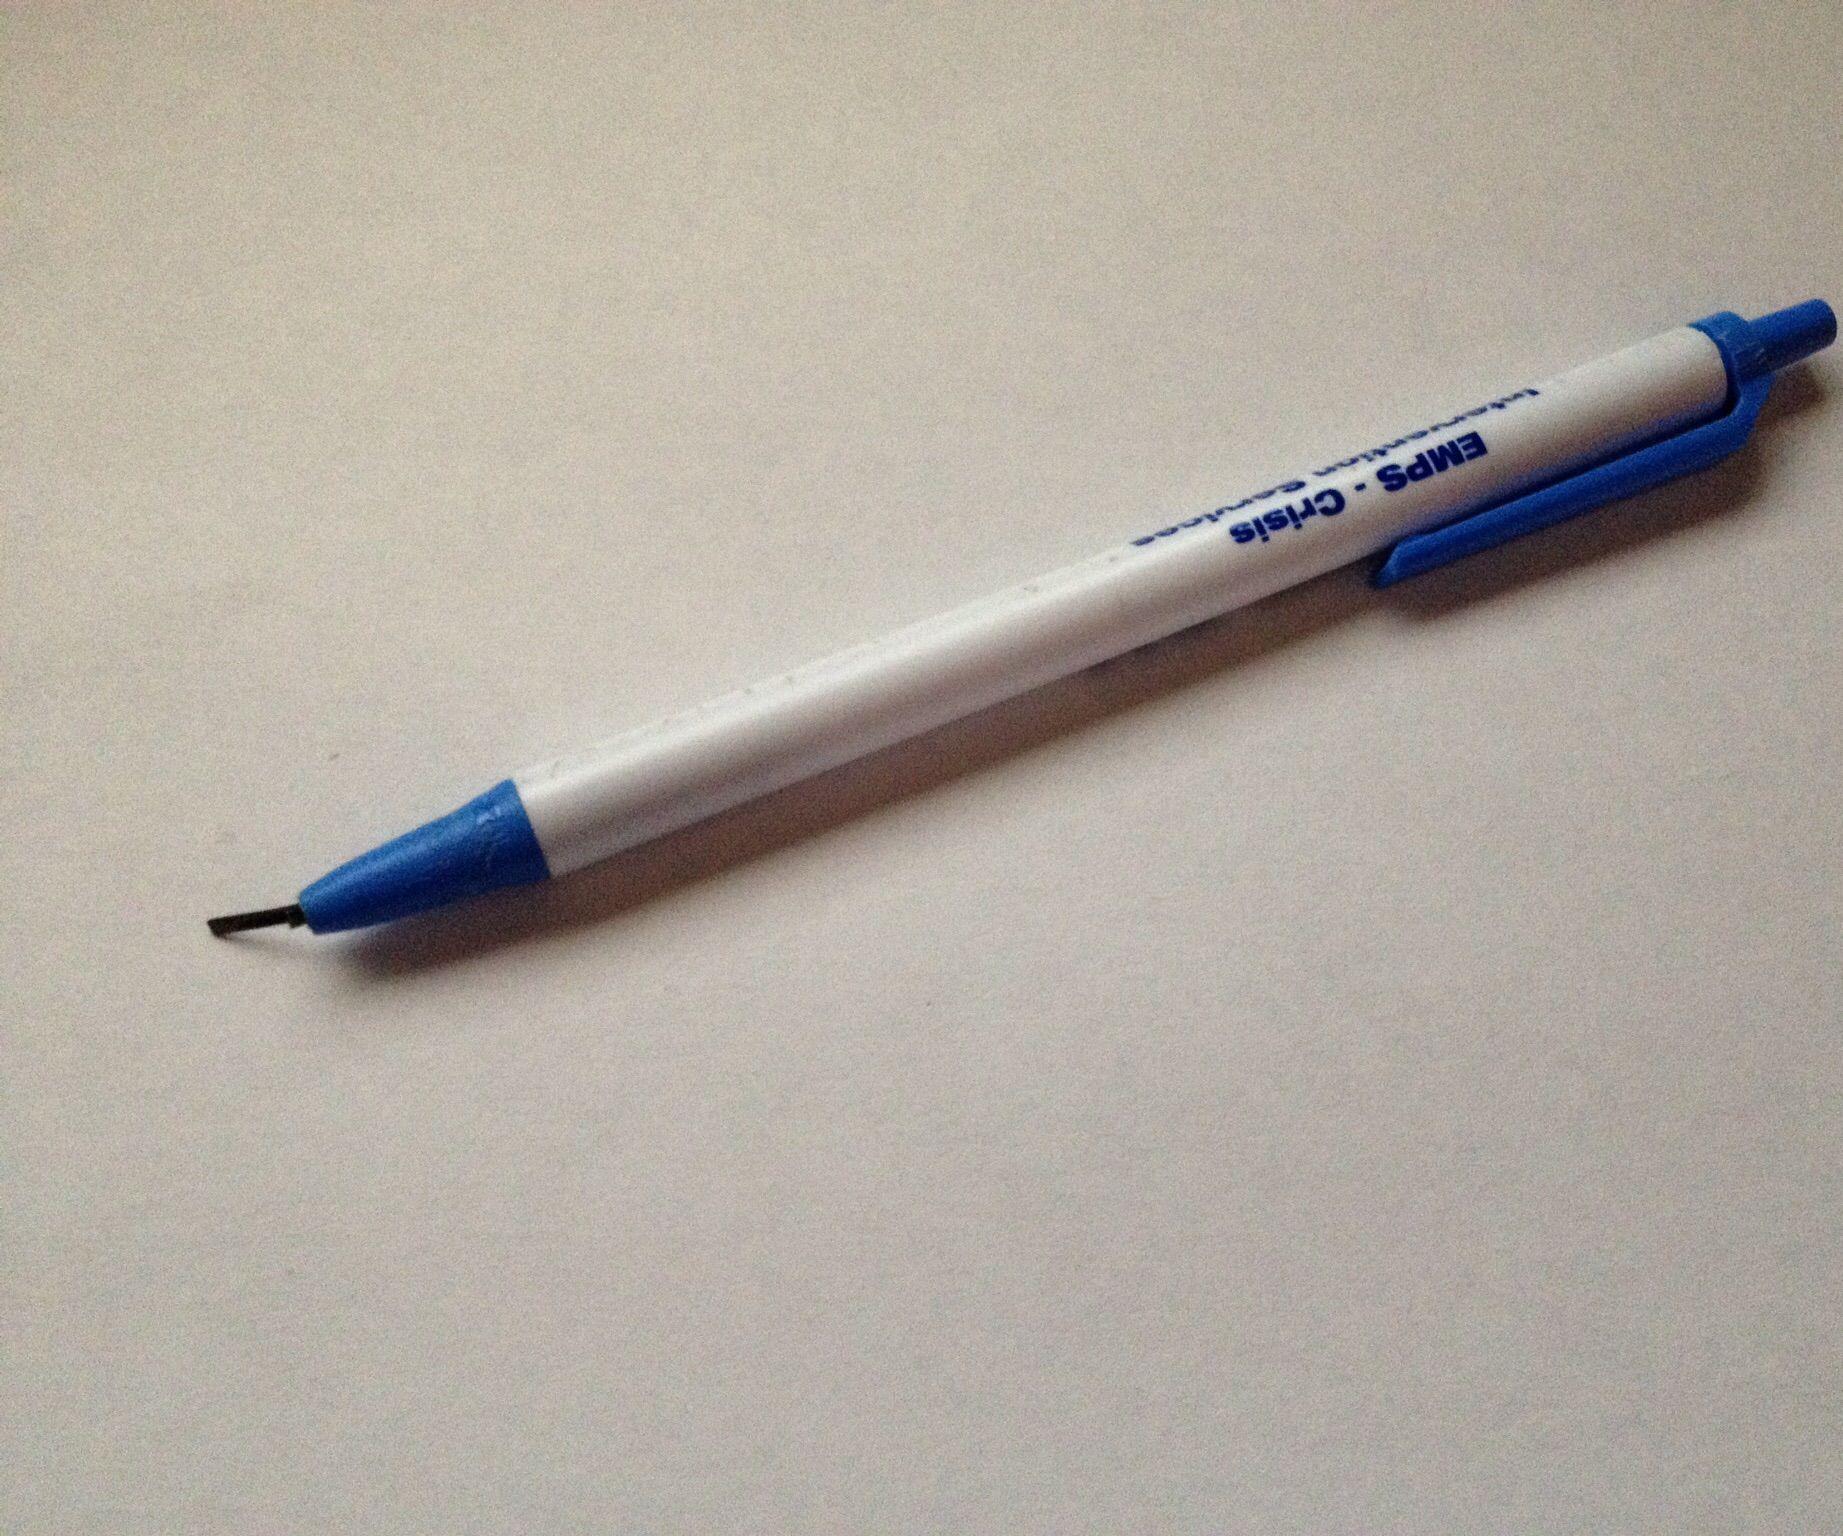 How to make a smoking pen